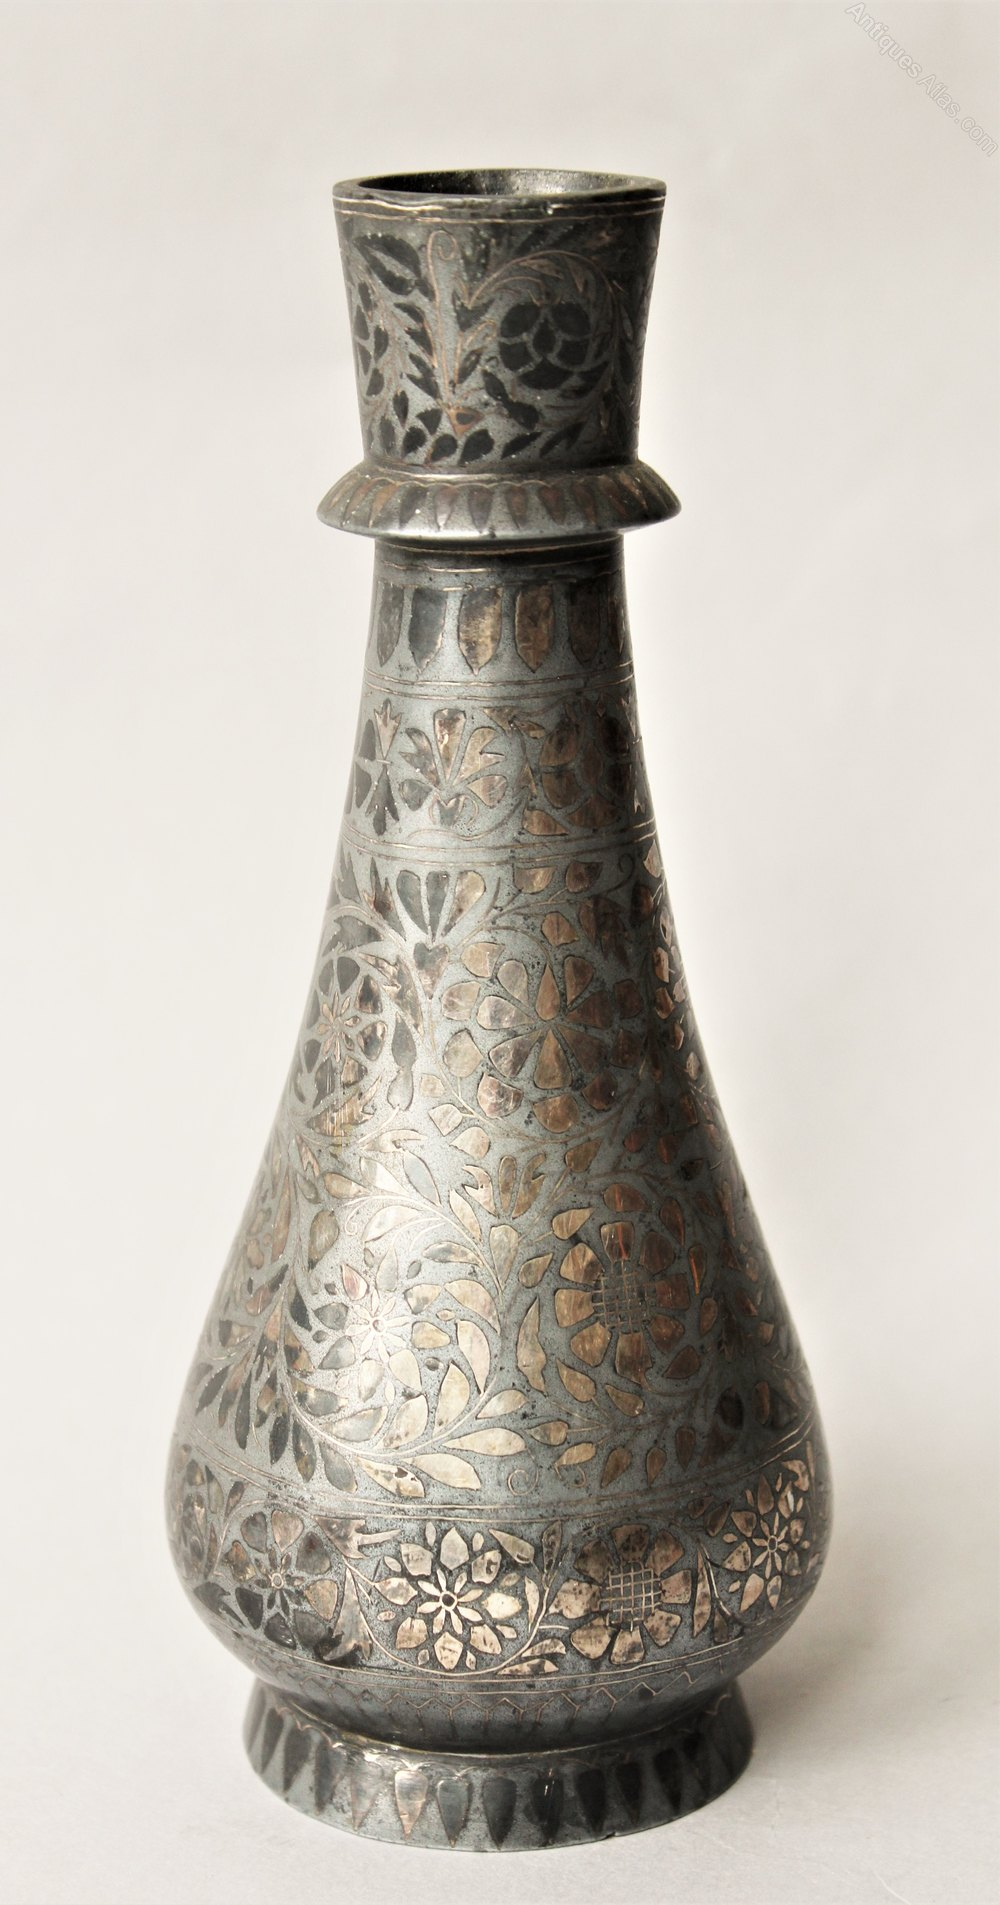 antiques atlas antique indian bidri vase silver inlay. Black Bedroom Furniture Sets. Home Design Ideas